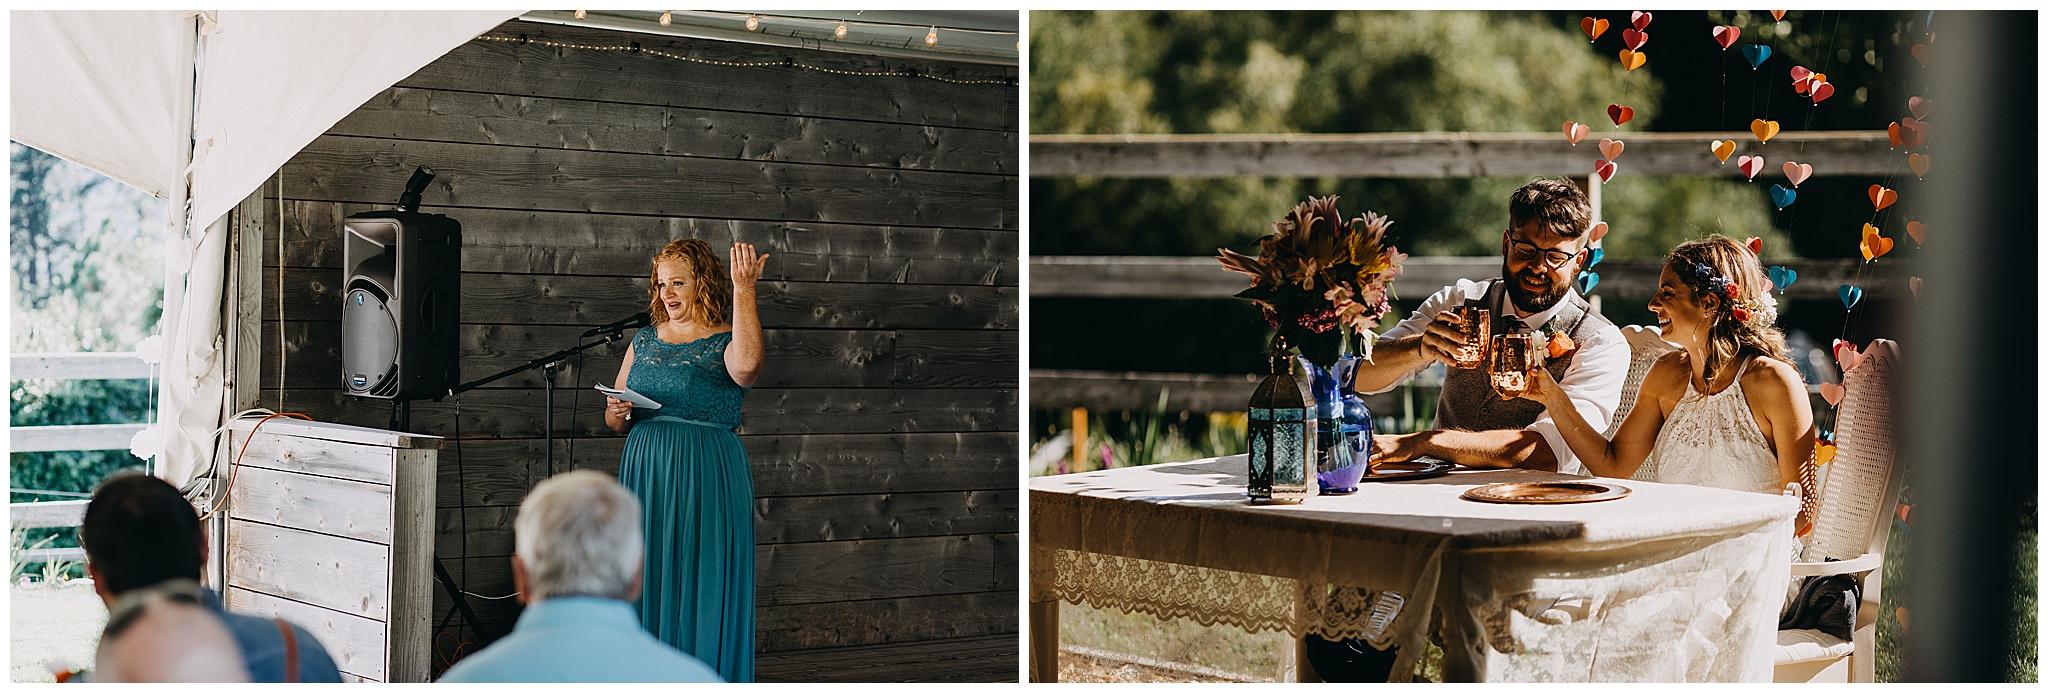 brown-family-homestead-wedding-tyler-elyse45.jpg